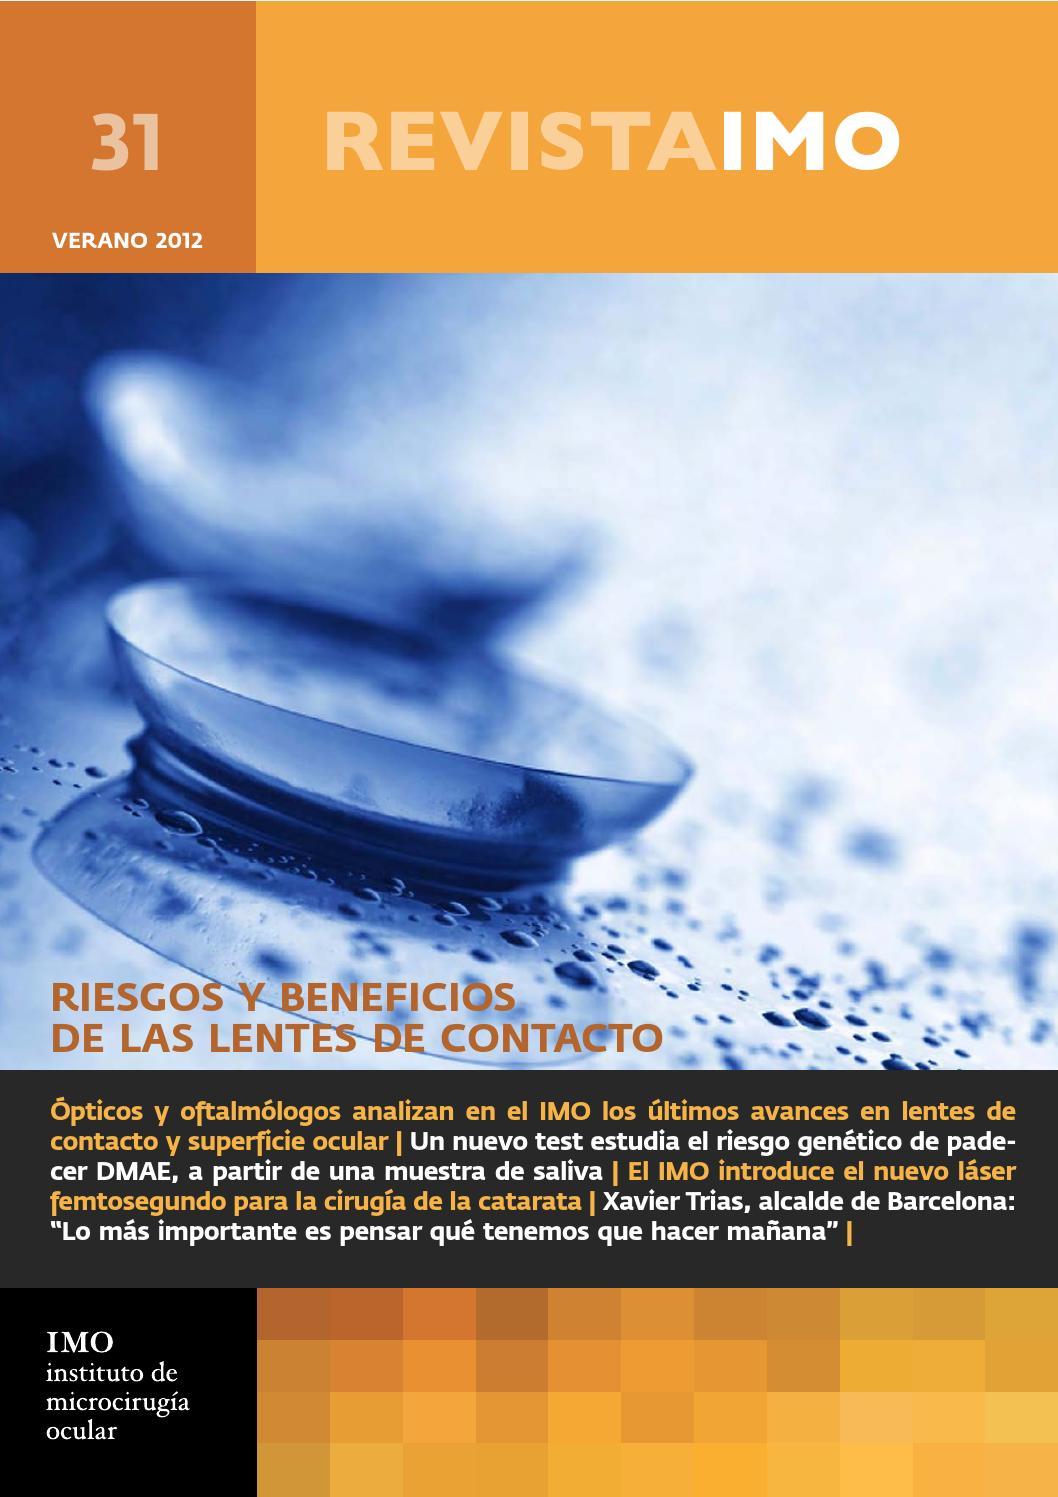 Revista IMO 31 by Instituto de Microcirugía Ocular (IMO) - issuu